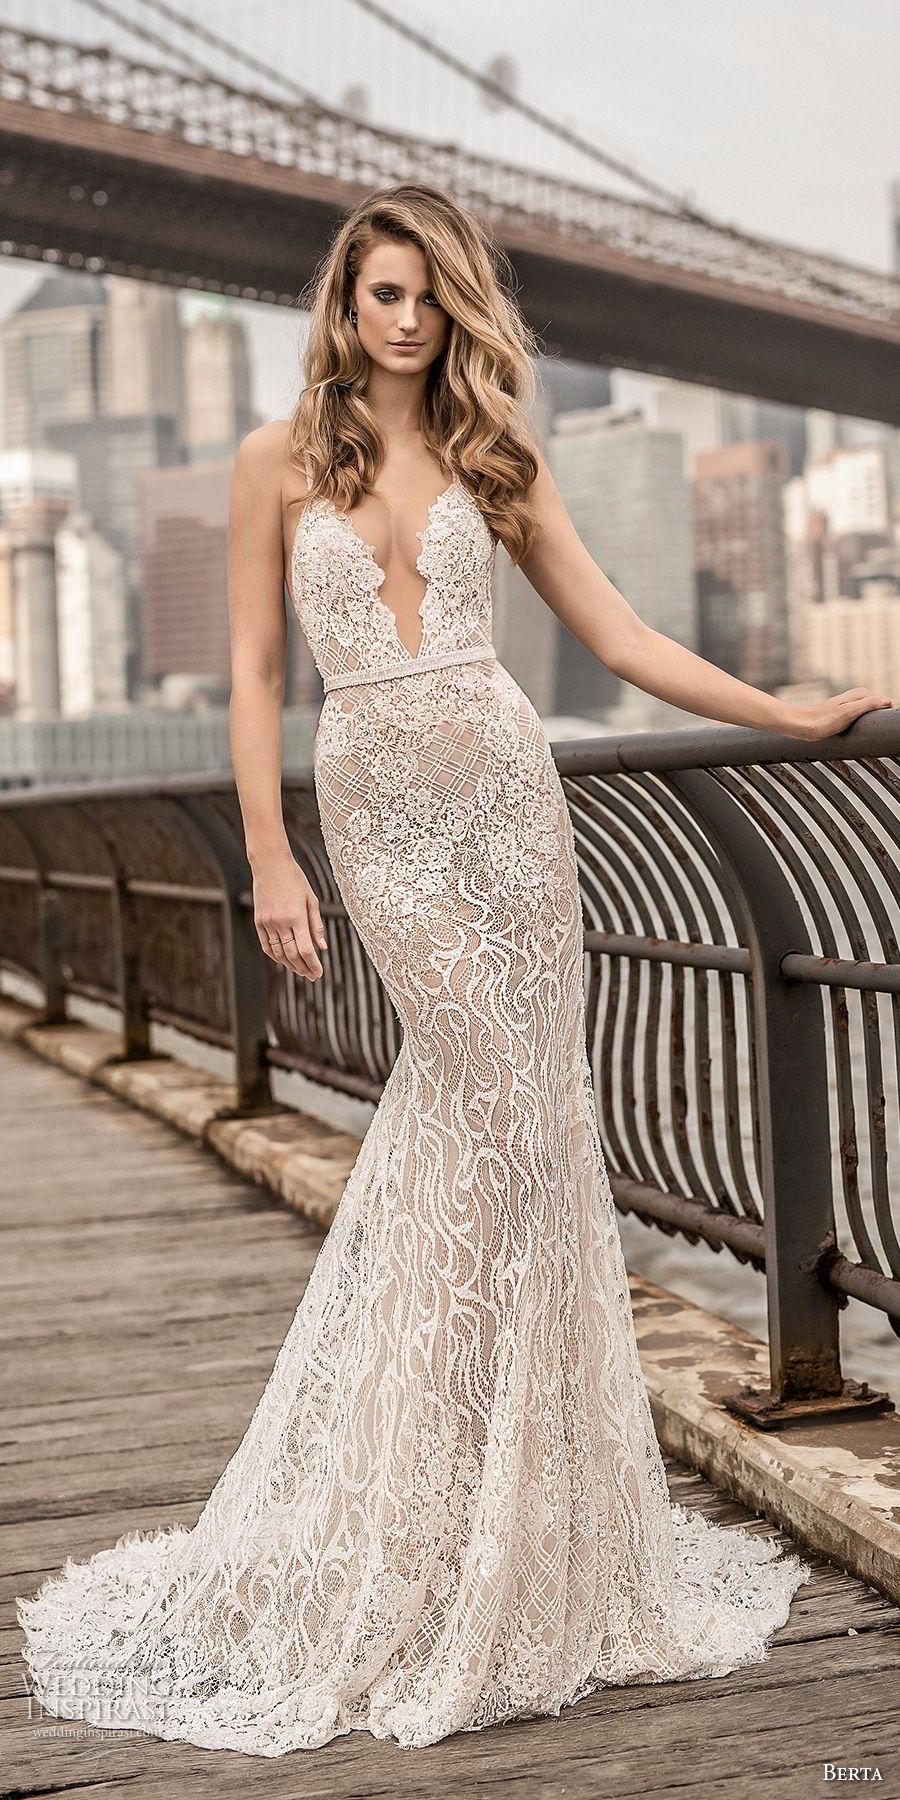 Berta Wedding Dresses.Berta Bridal Spring 2018 Wedding Dresses Part 2 Crazyforus